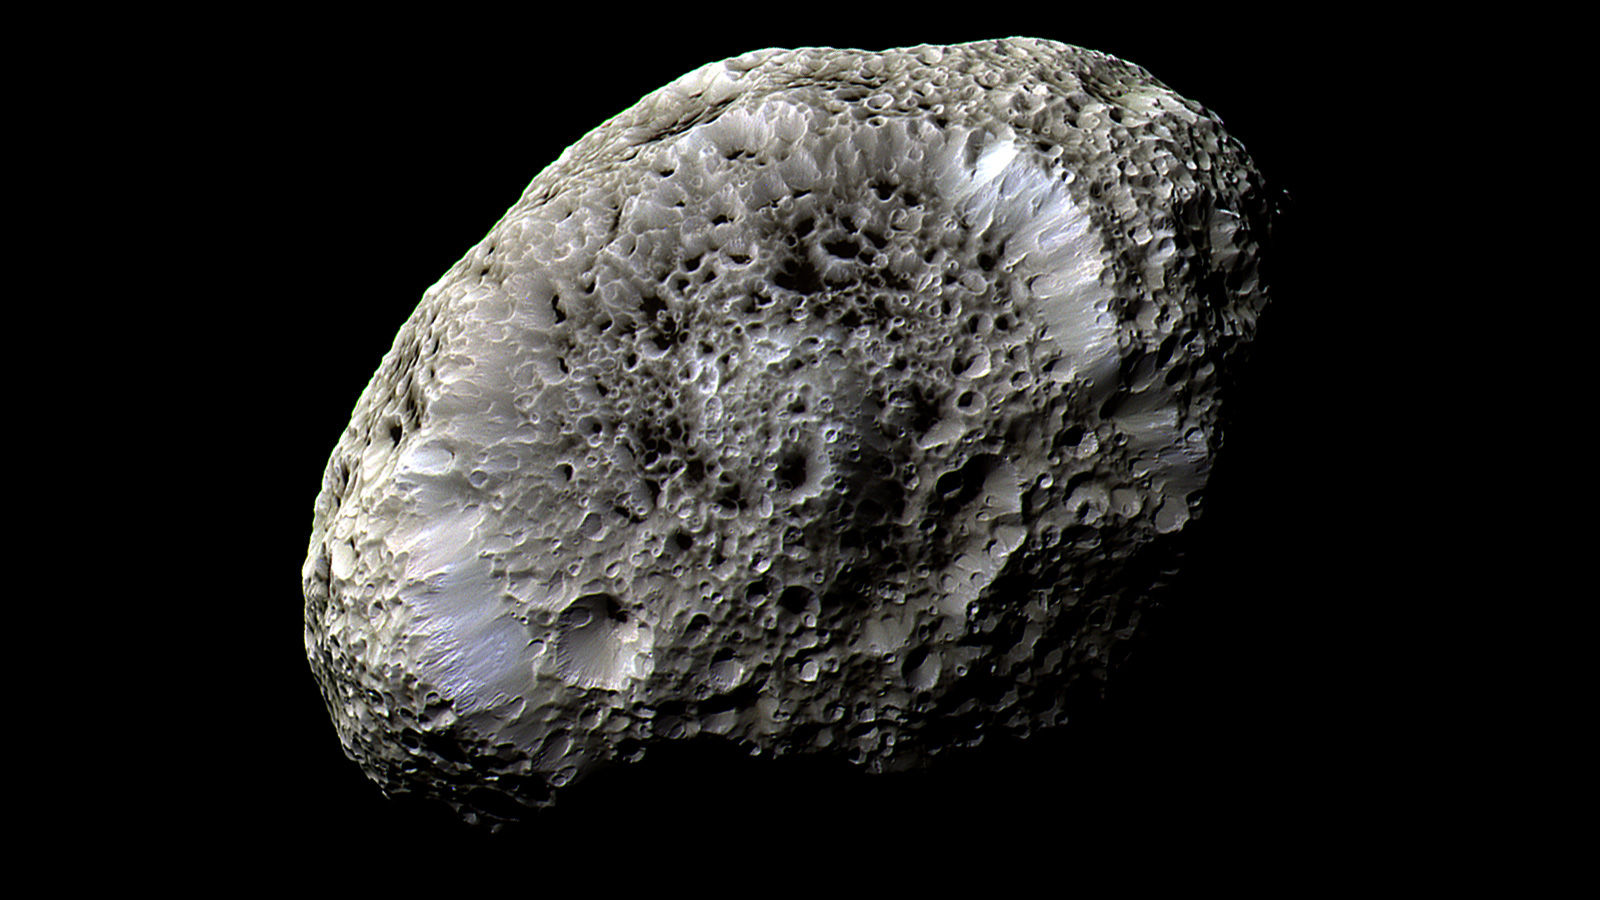 Гиперион «ударил» током пролетавший вблизи Кассини